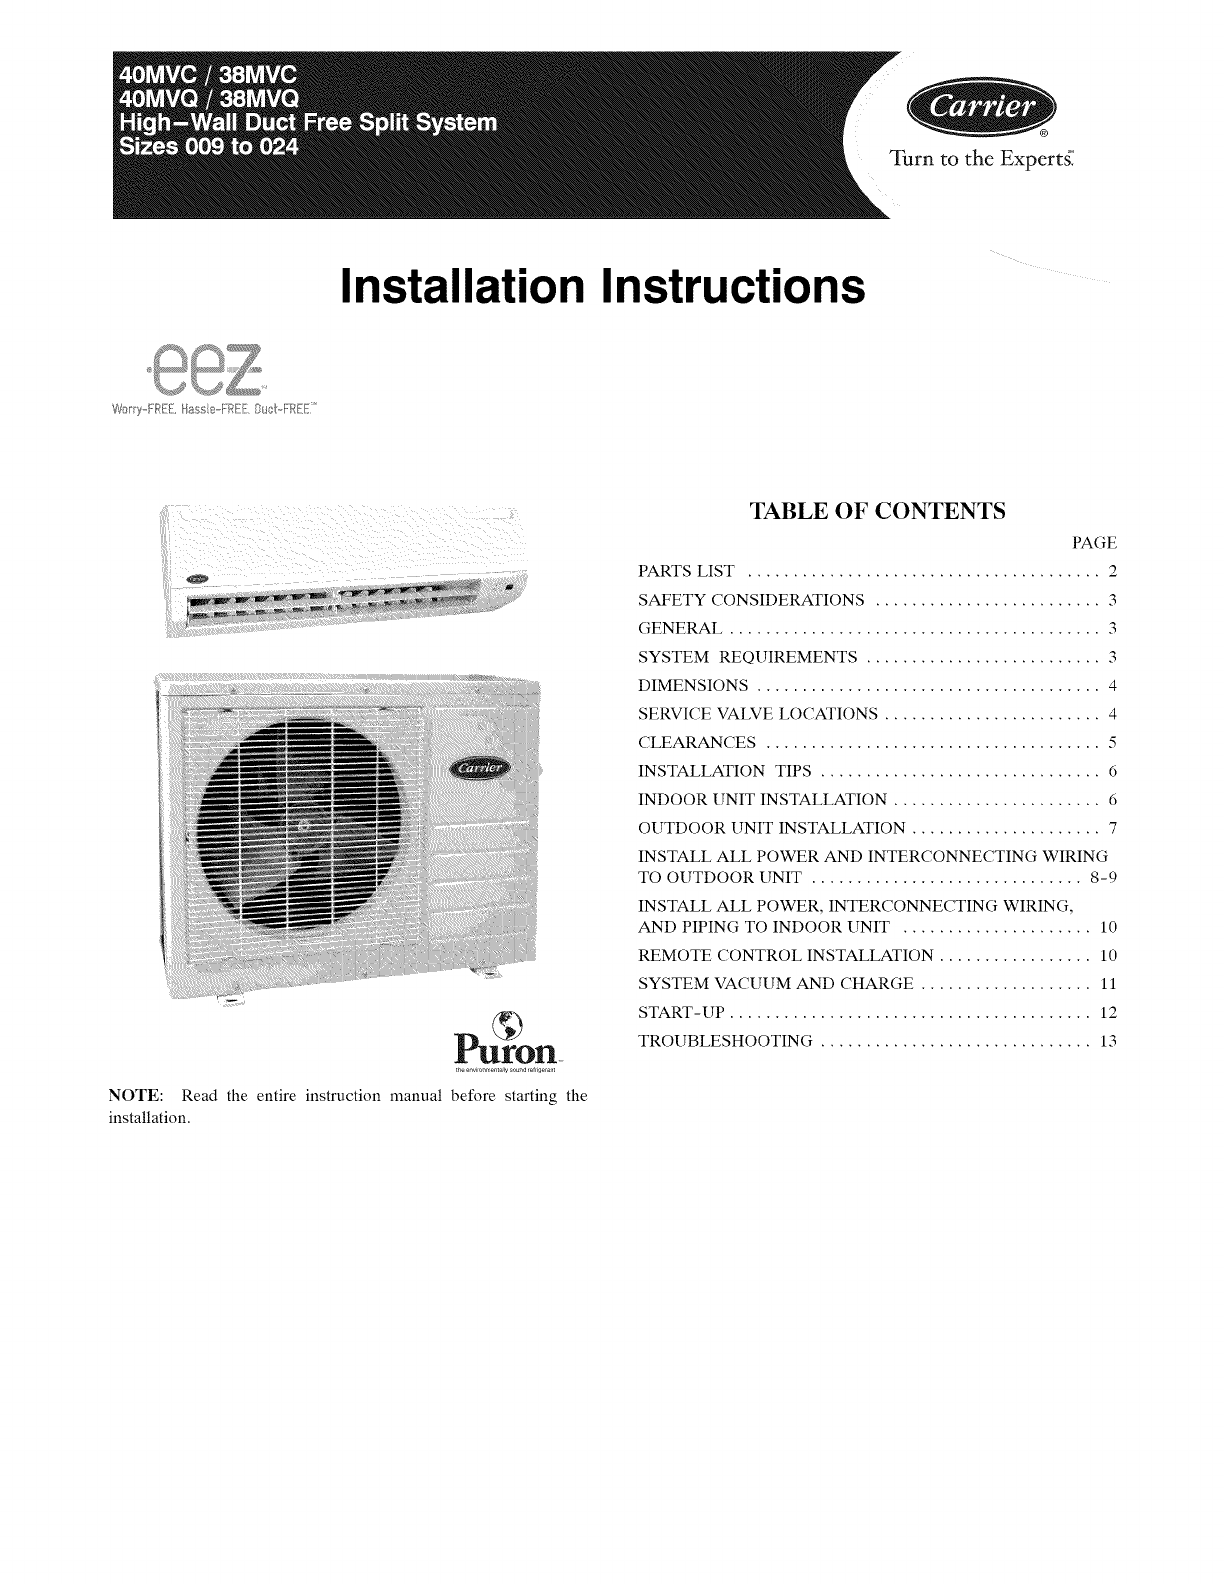 CARRIER Air Handler (indoor Blower&evap) Manual L0904251